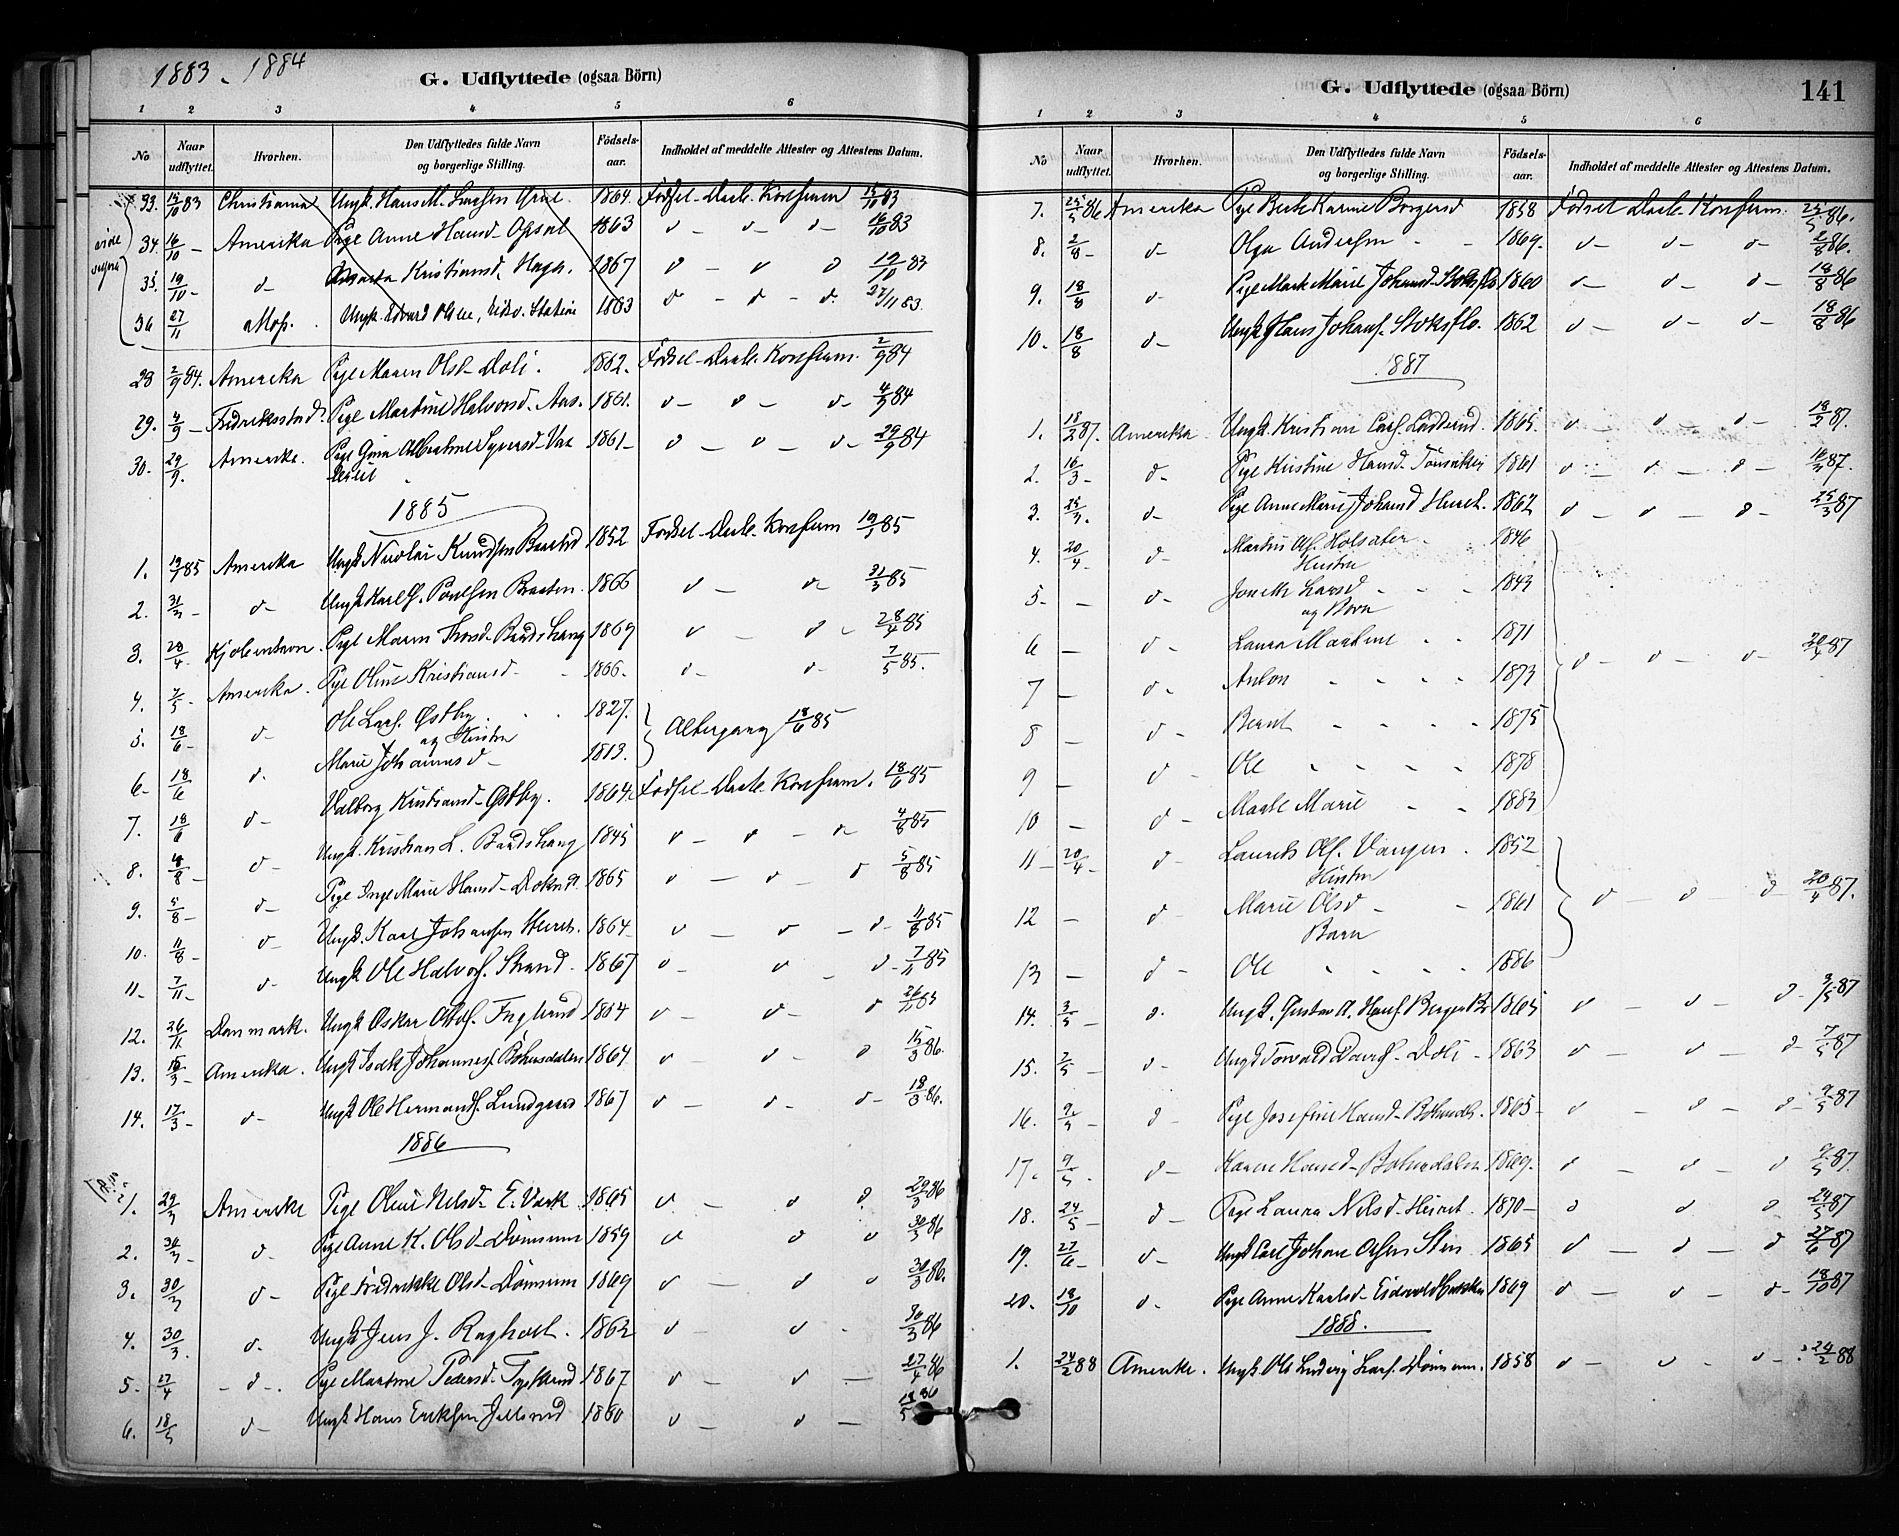 SAO, Eidsvoll prestekontor Kirkebøker, F/Fa/L0003: Ministerialbok nr. I 3, 1882-1895, s. 141